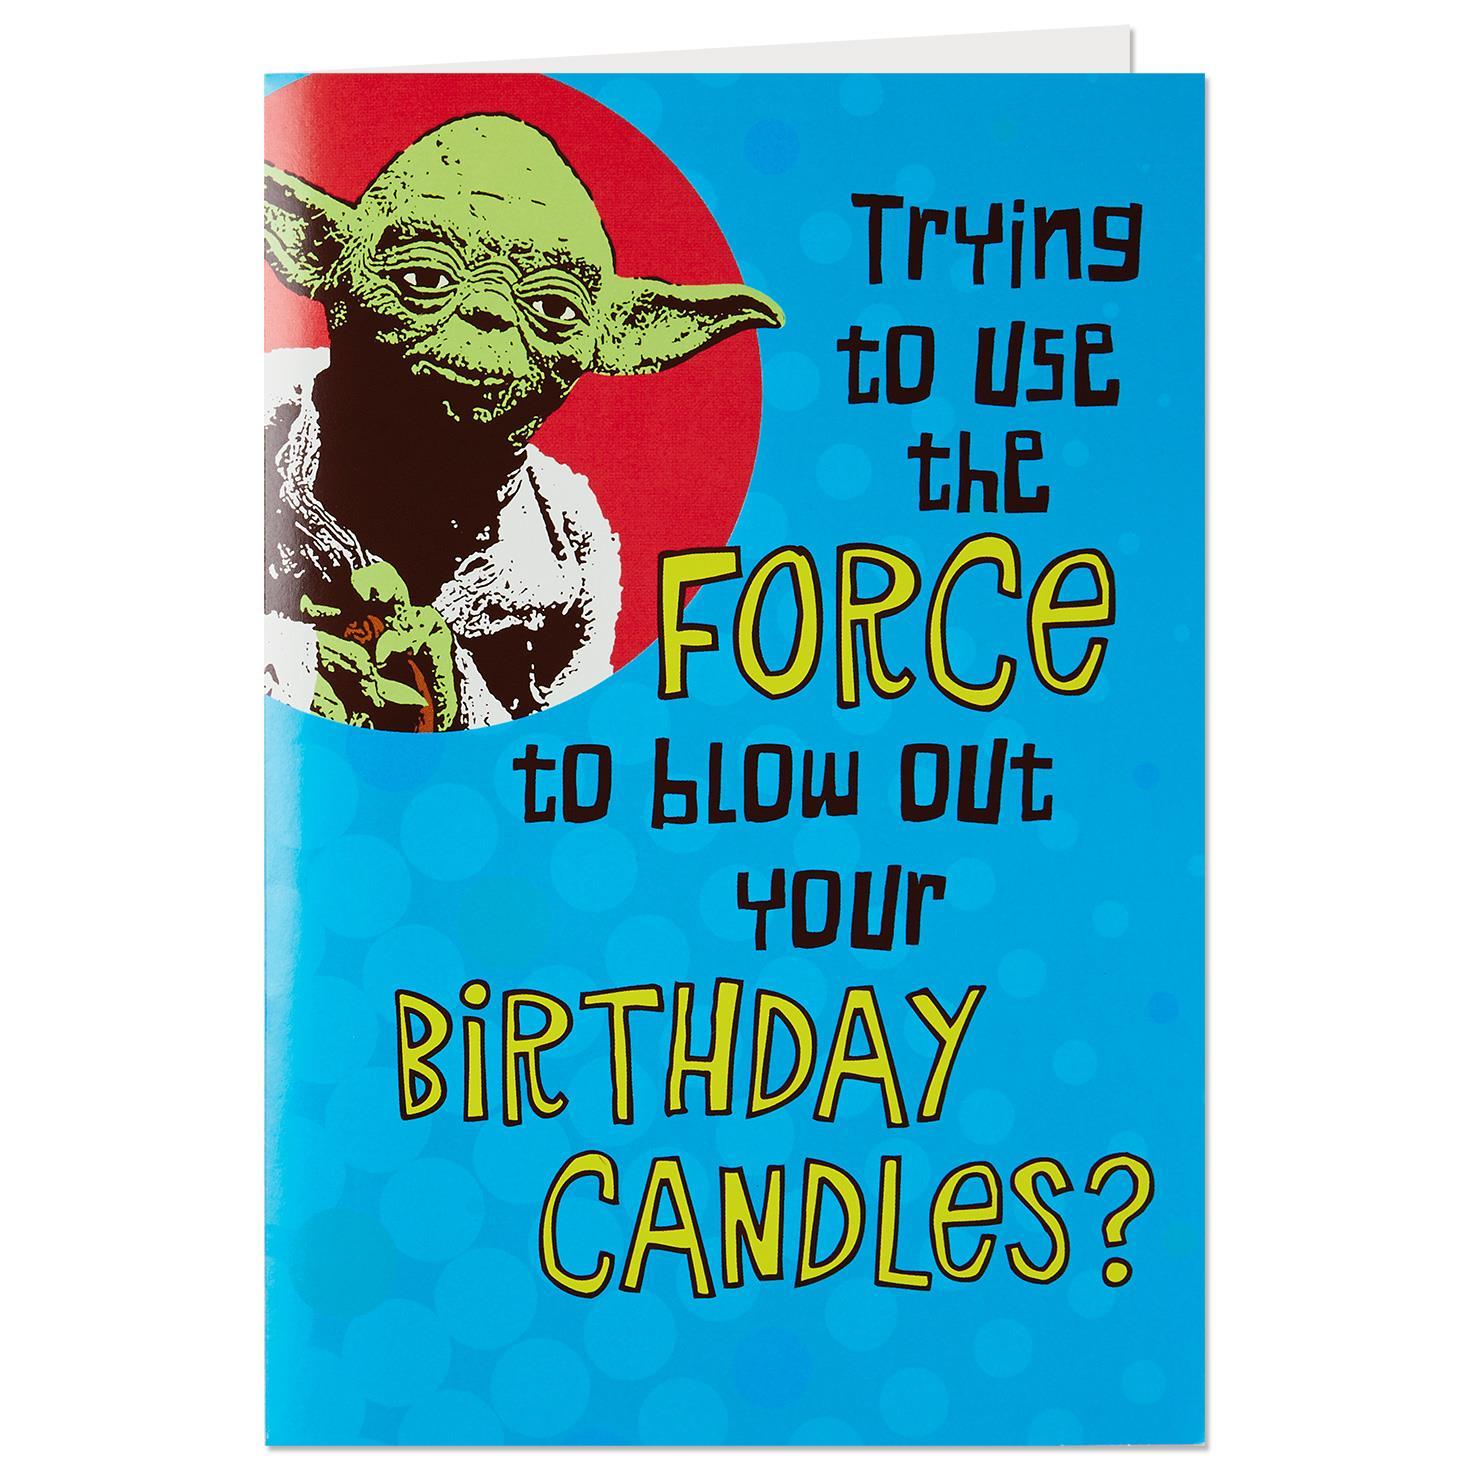 Star Wars™ Yoda™ Trick Candles Birthday Card With Sound